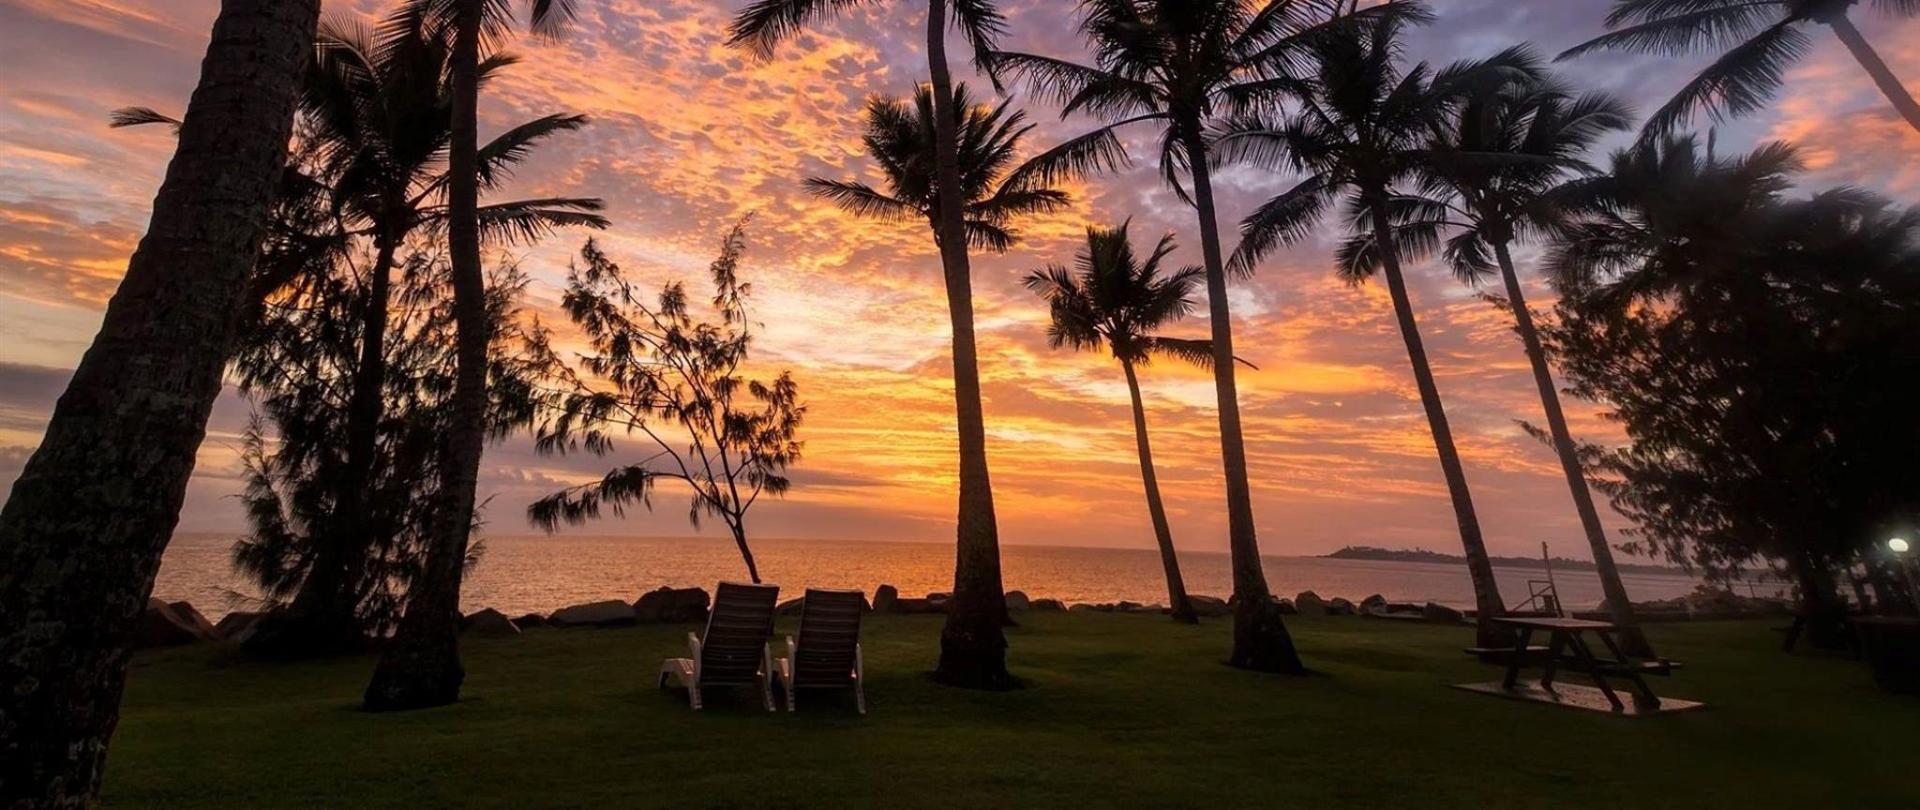 sunrise-on-tuesday-by-belinda-mcmahon.jpg